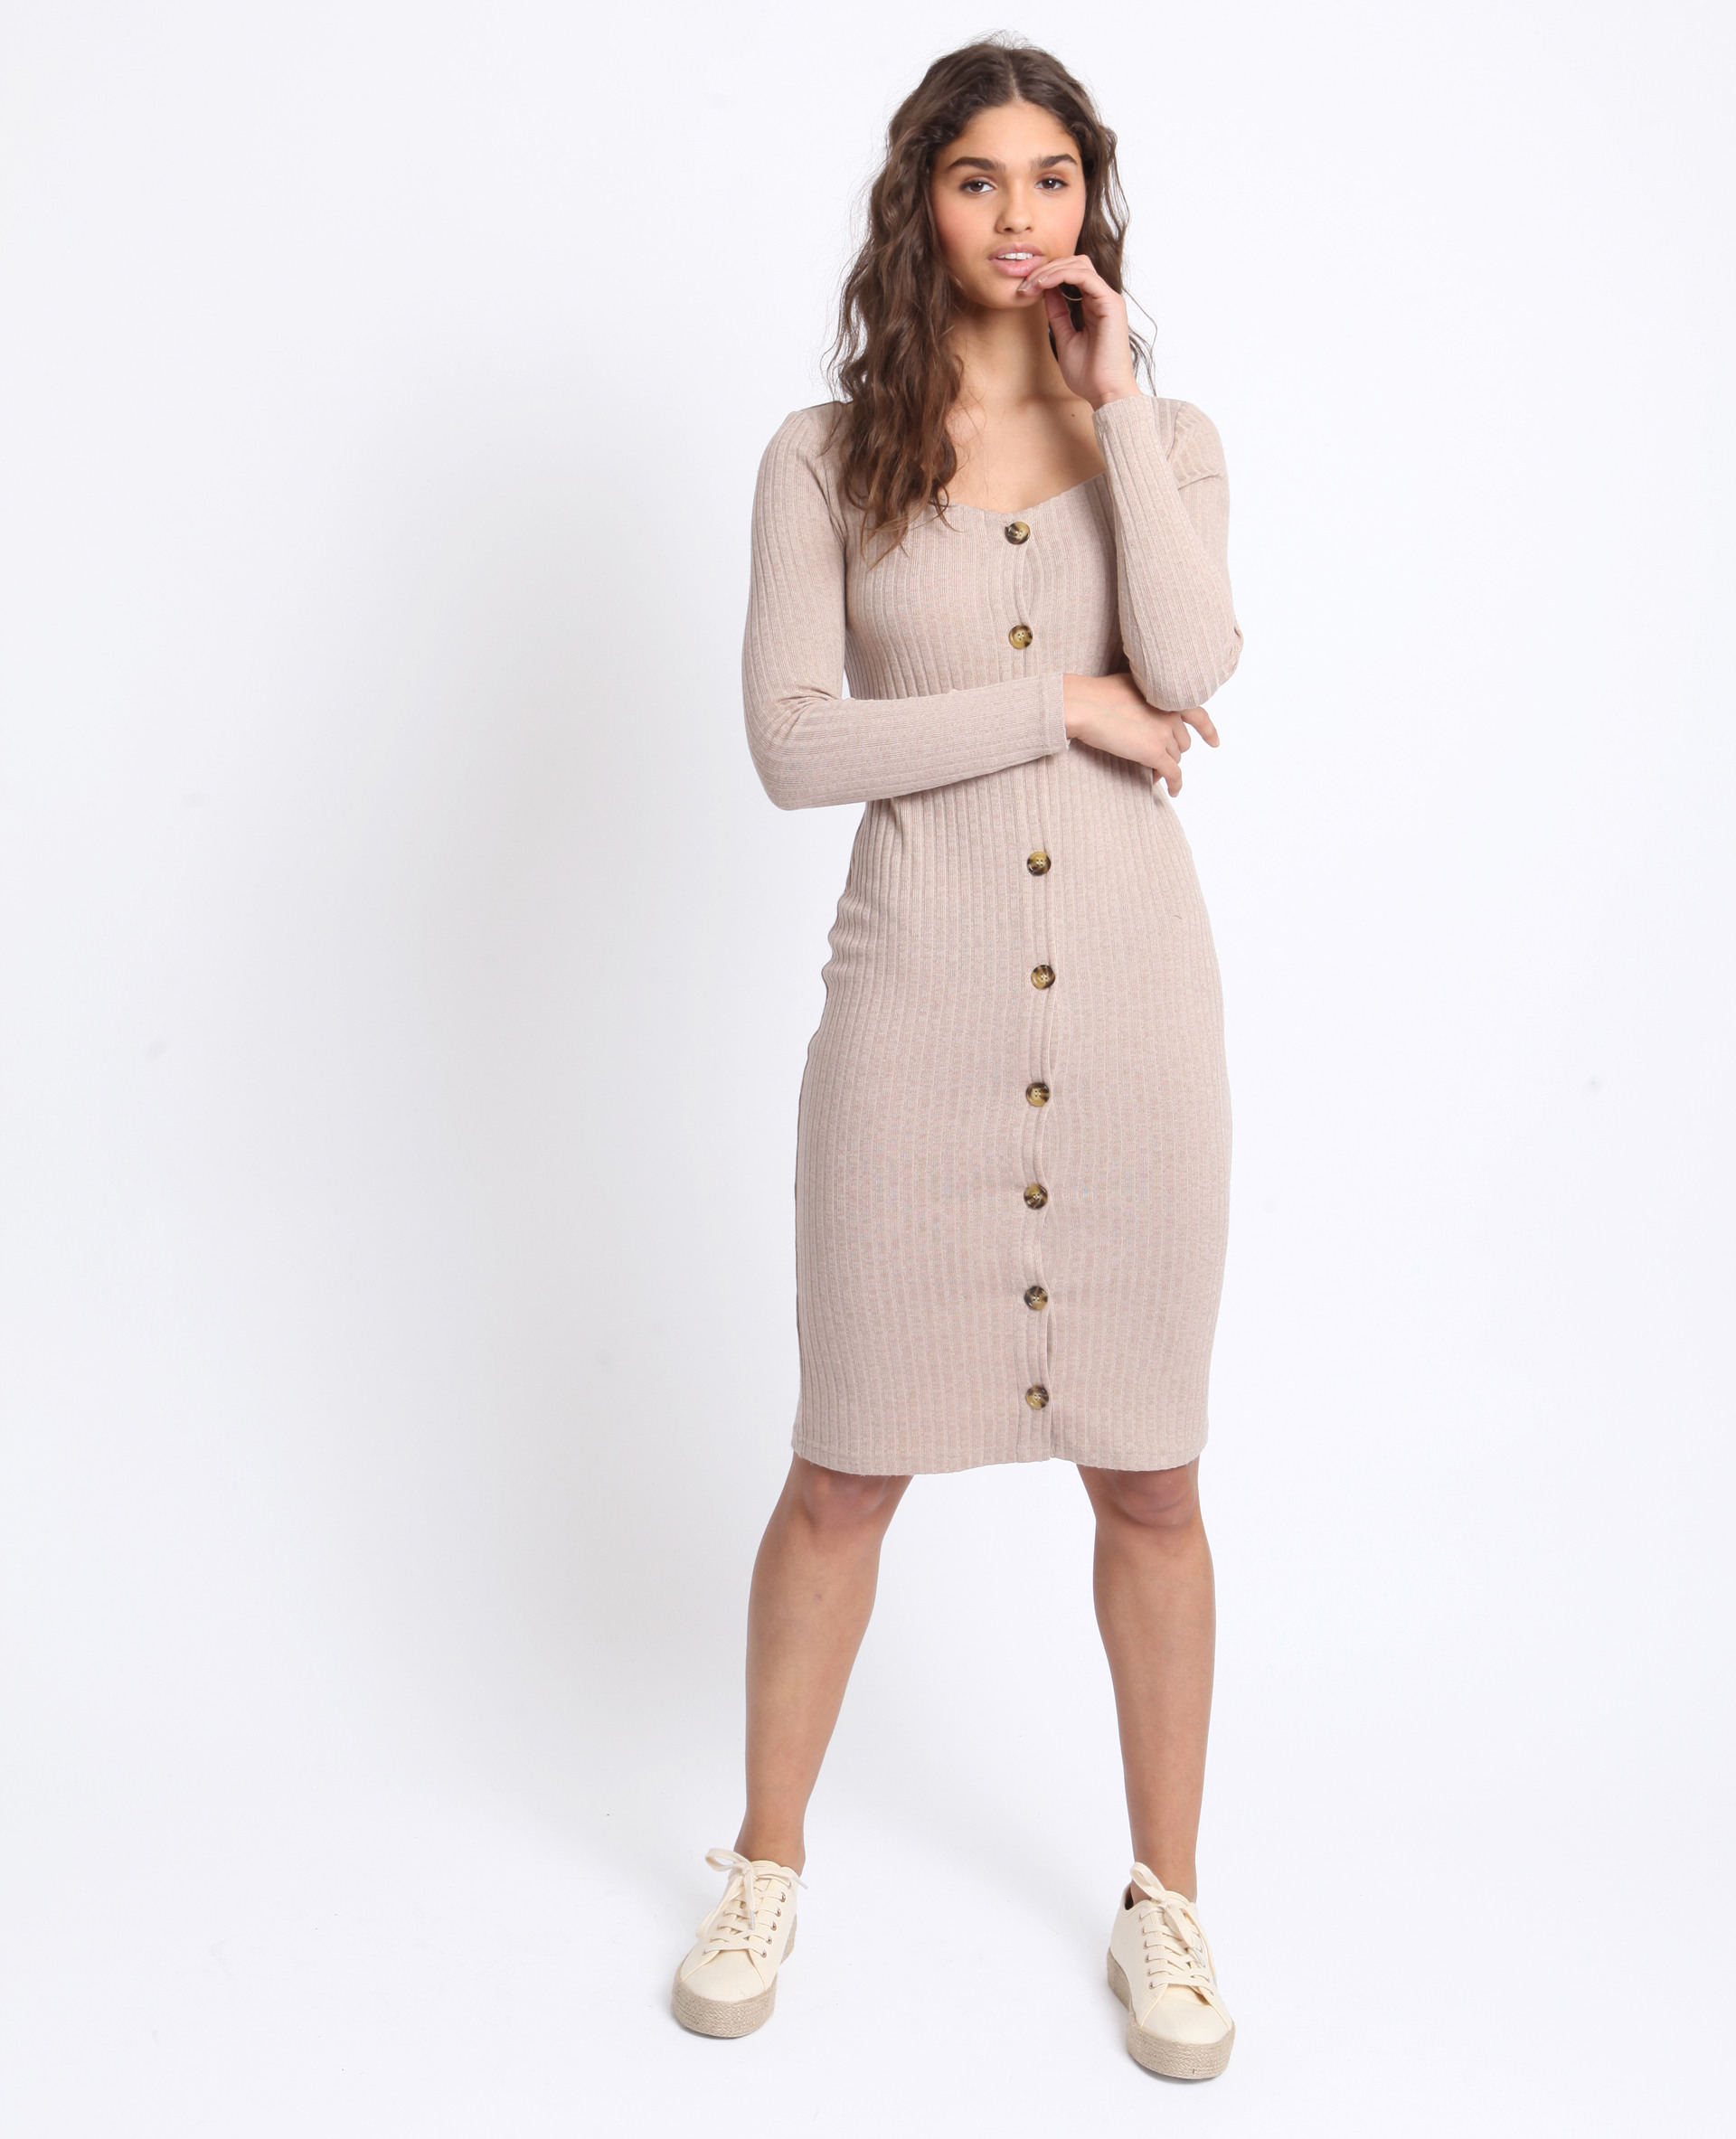 Langes Geripptes Kleid Braun  780961741J07  Pimkie